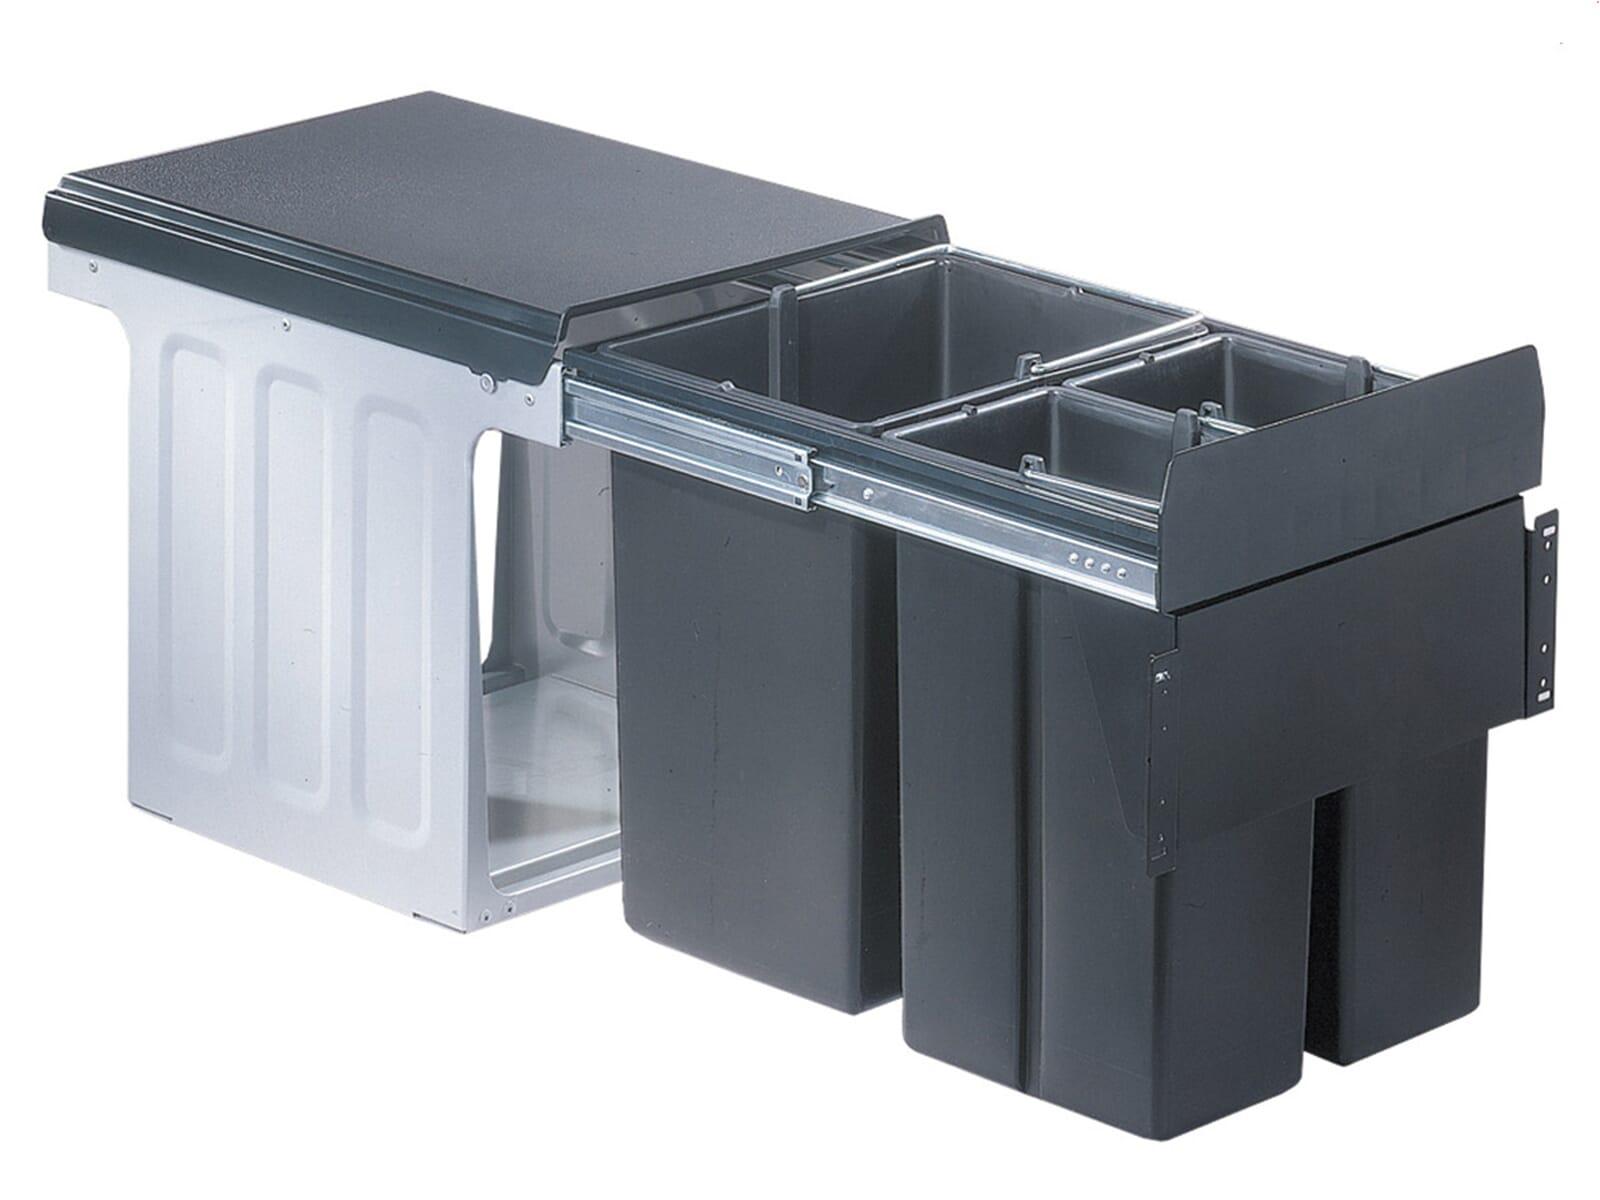 wesco bio trio profi front 40 885401 11 einbau abfallsammler. Black Bedroom Furniture Sets. Home Design Ideas